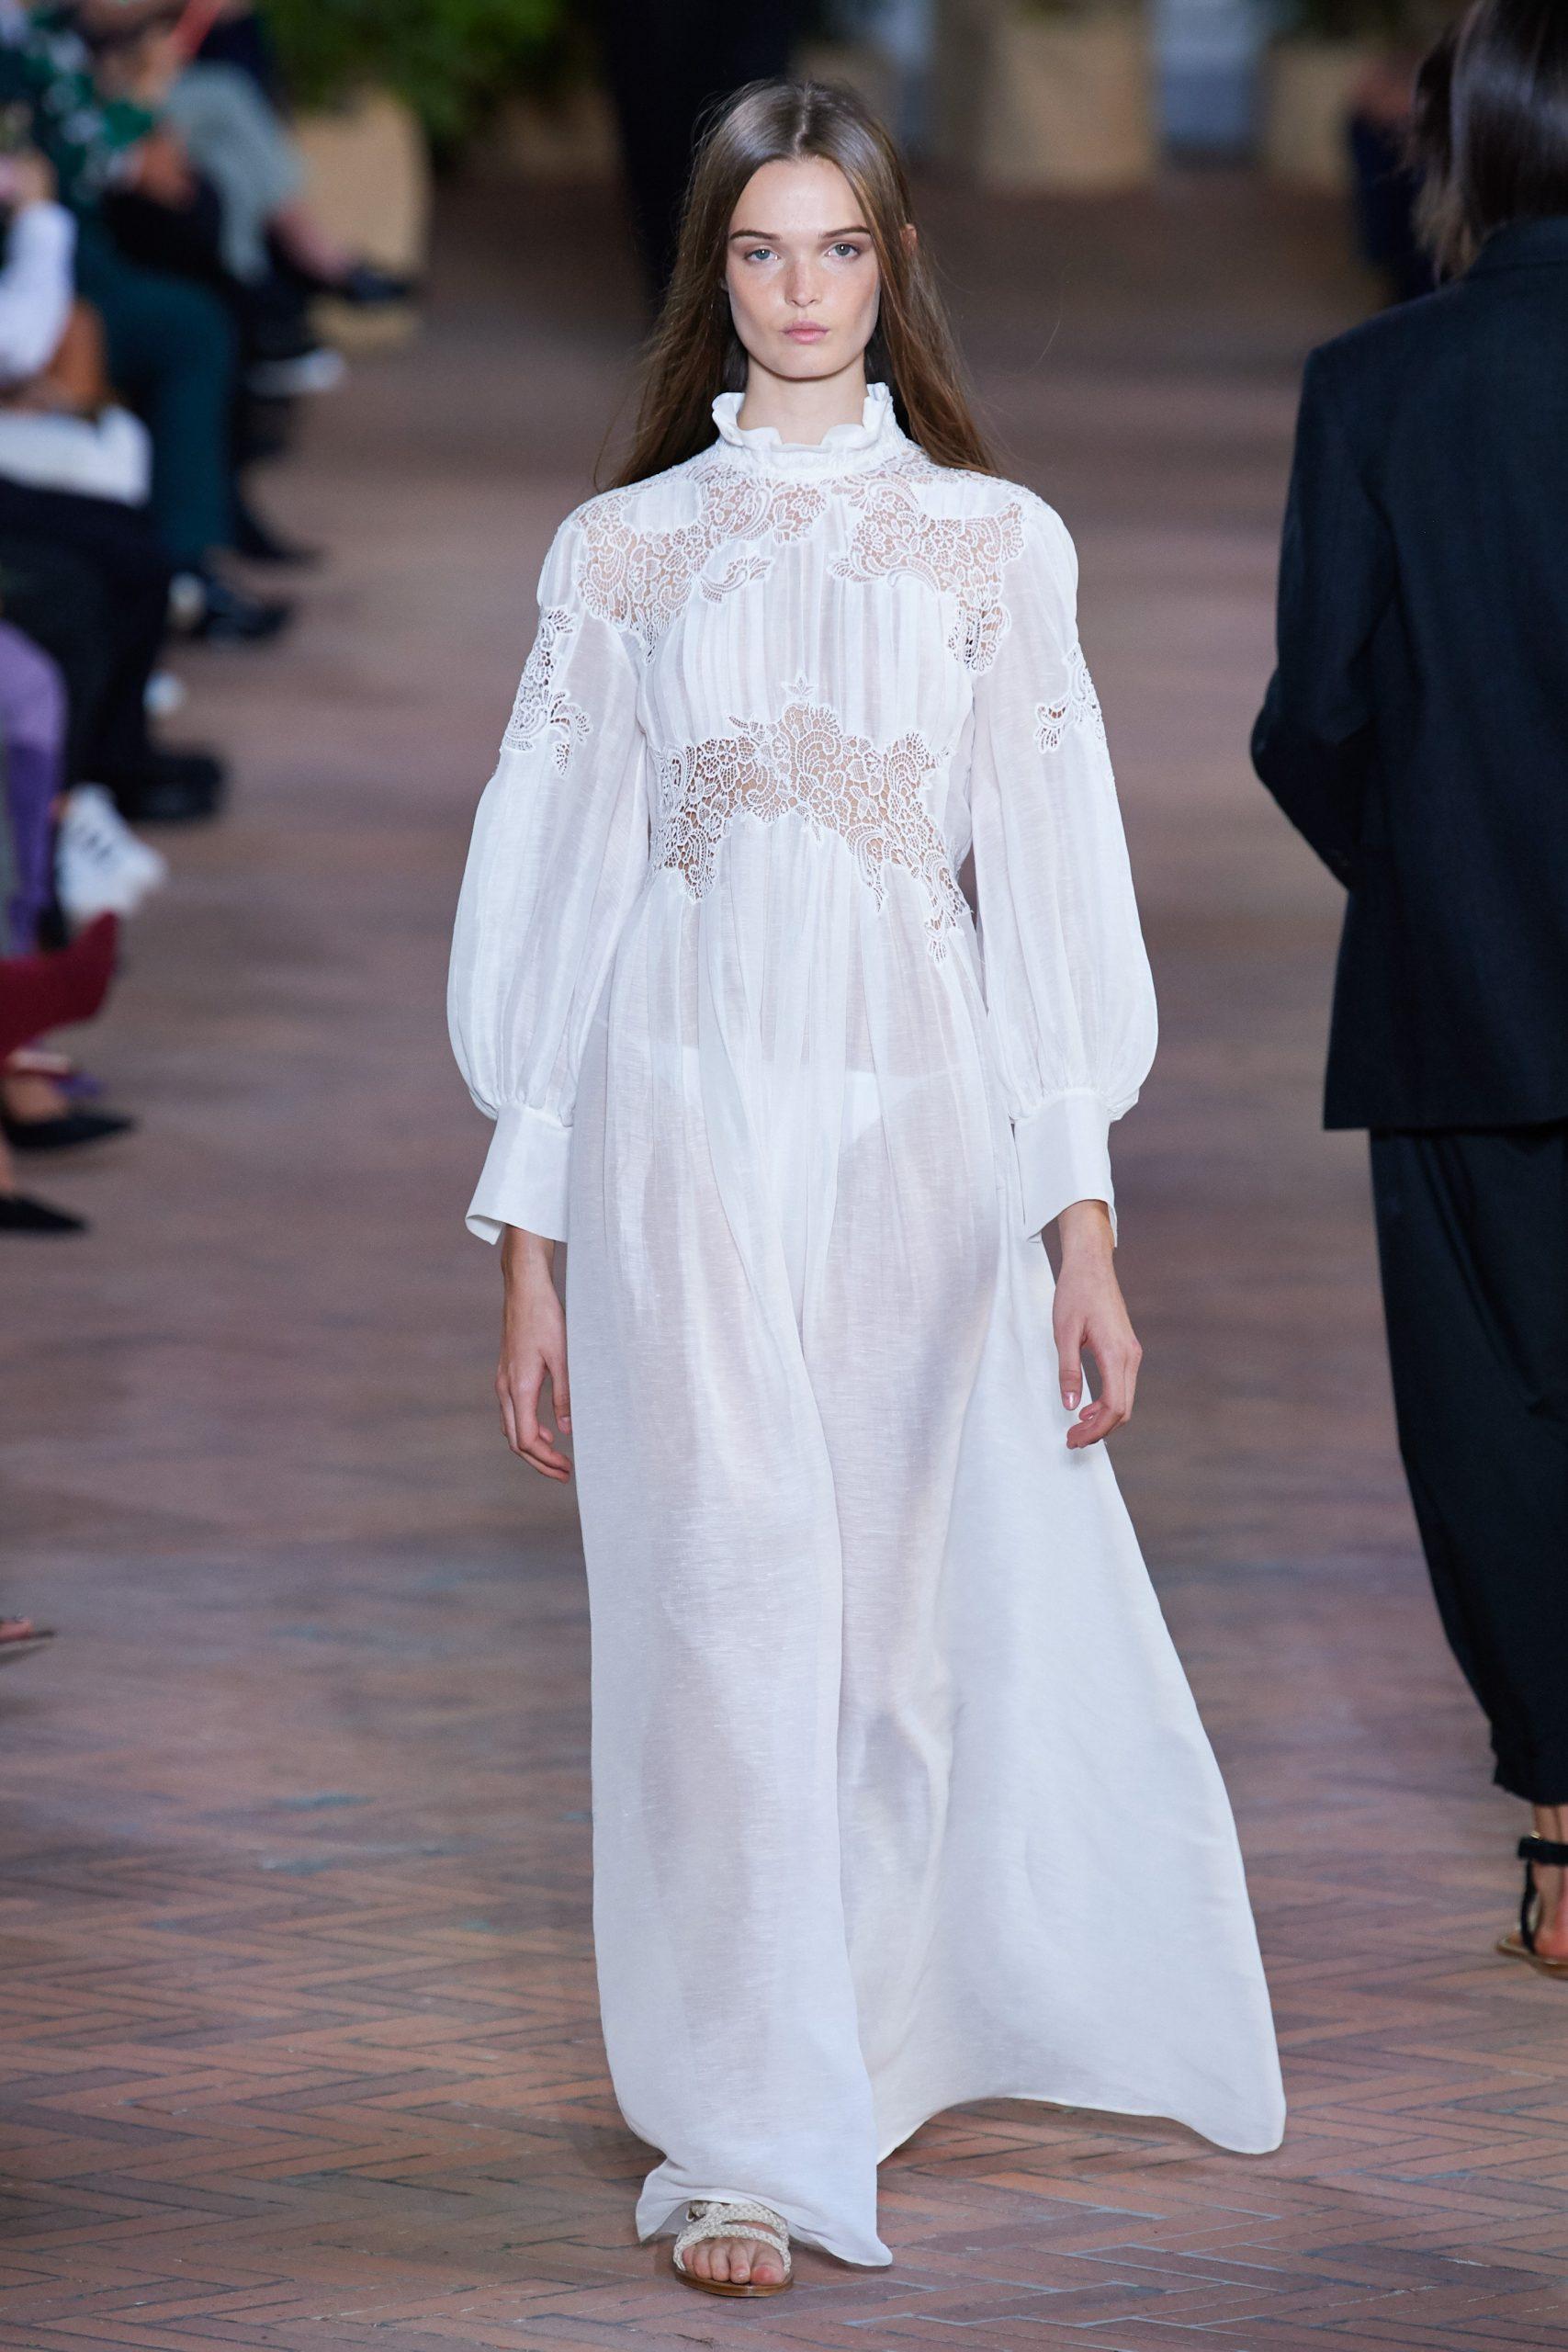 Alberta Ferretti Spring 2021, vestidos de novia para mujeres alternativas - Wedding Hub - 07